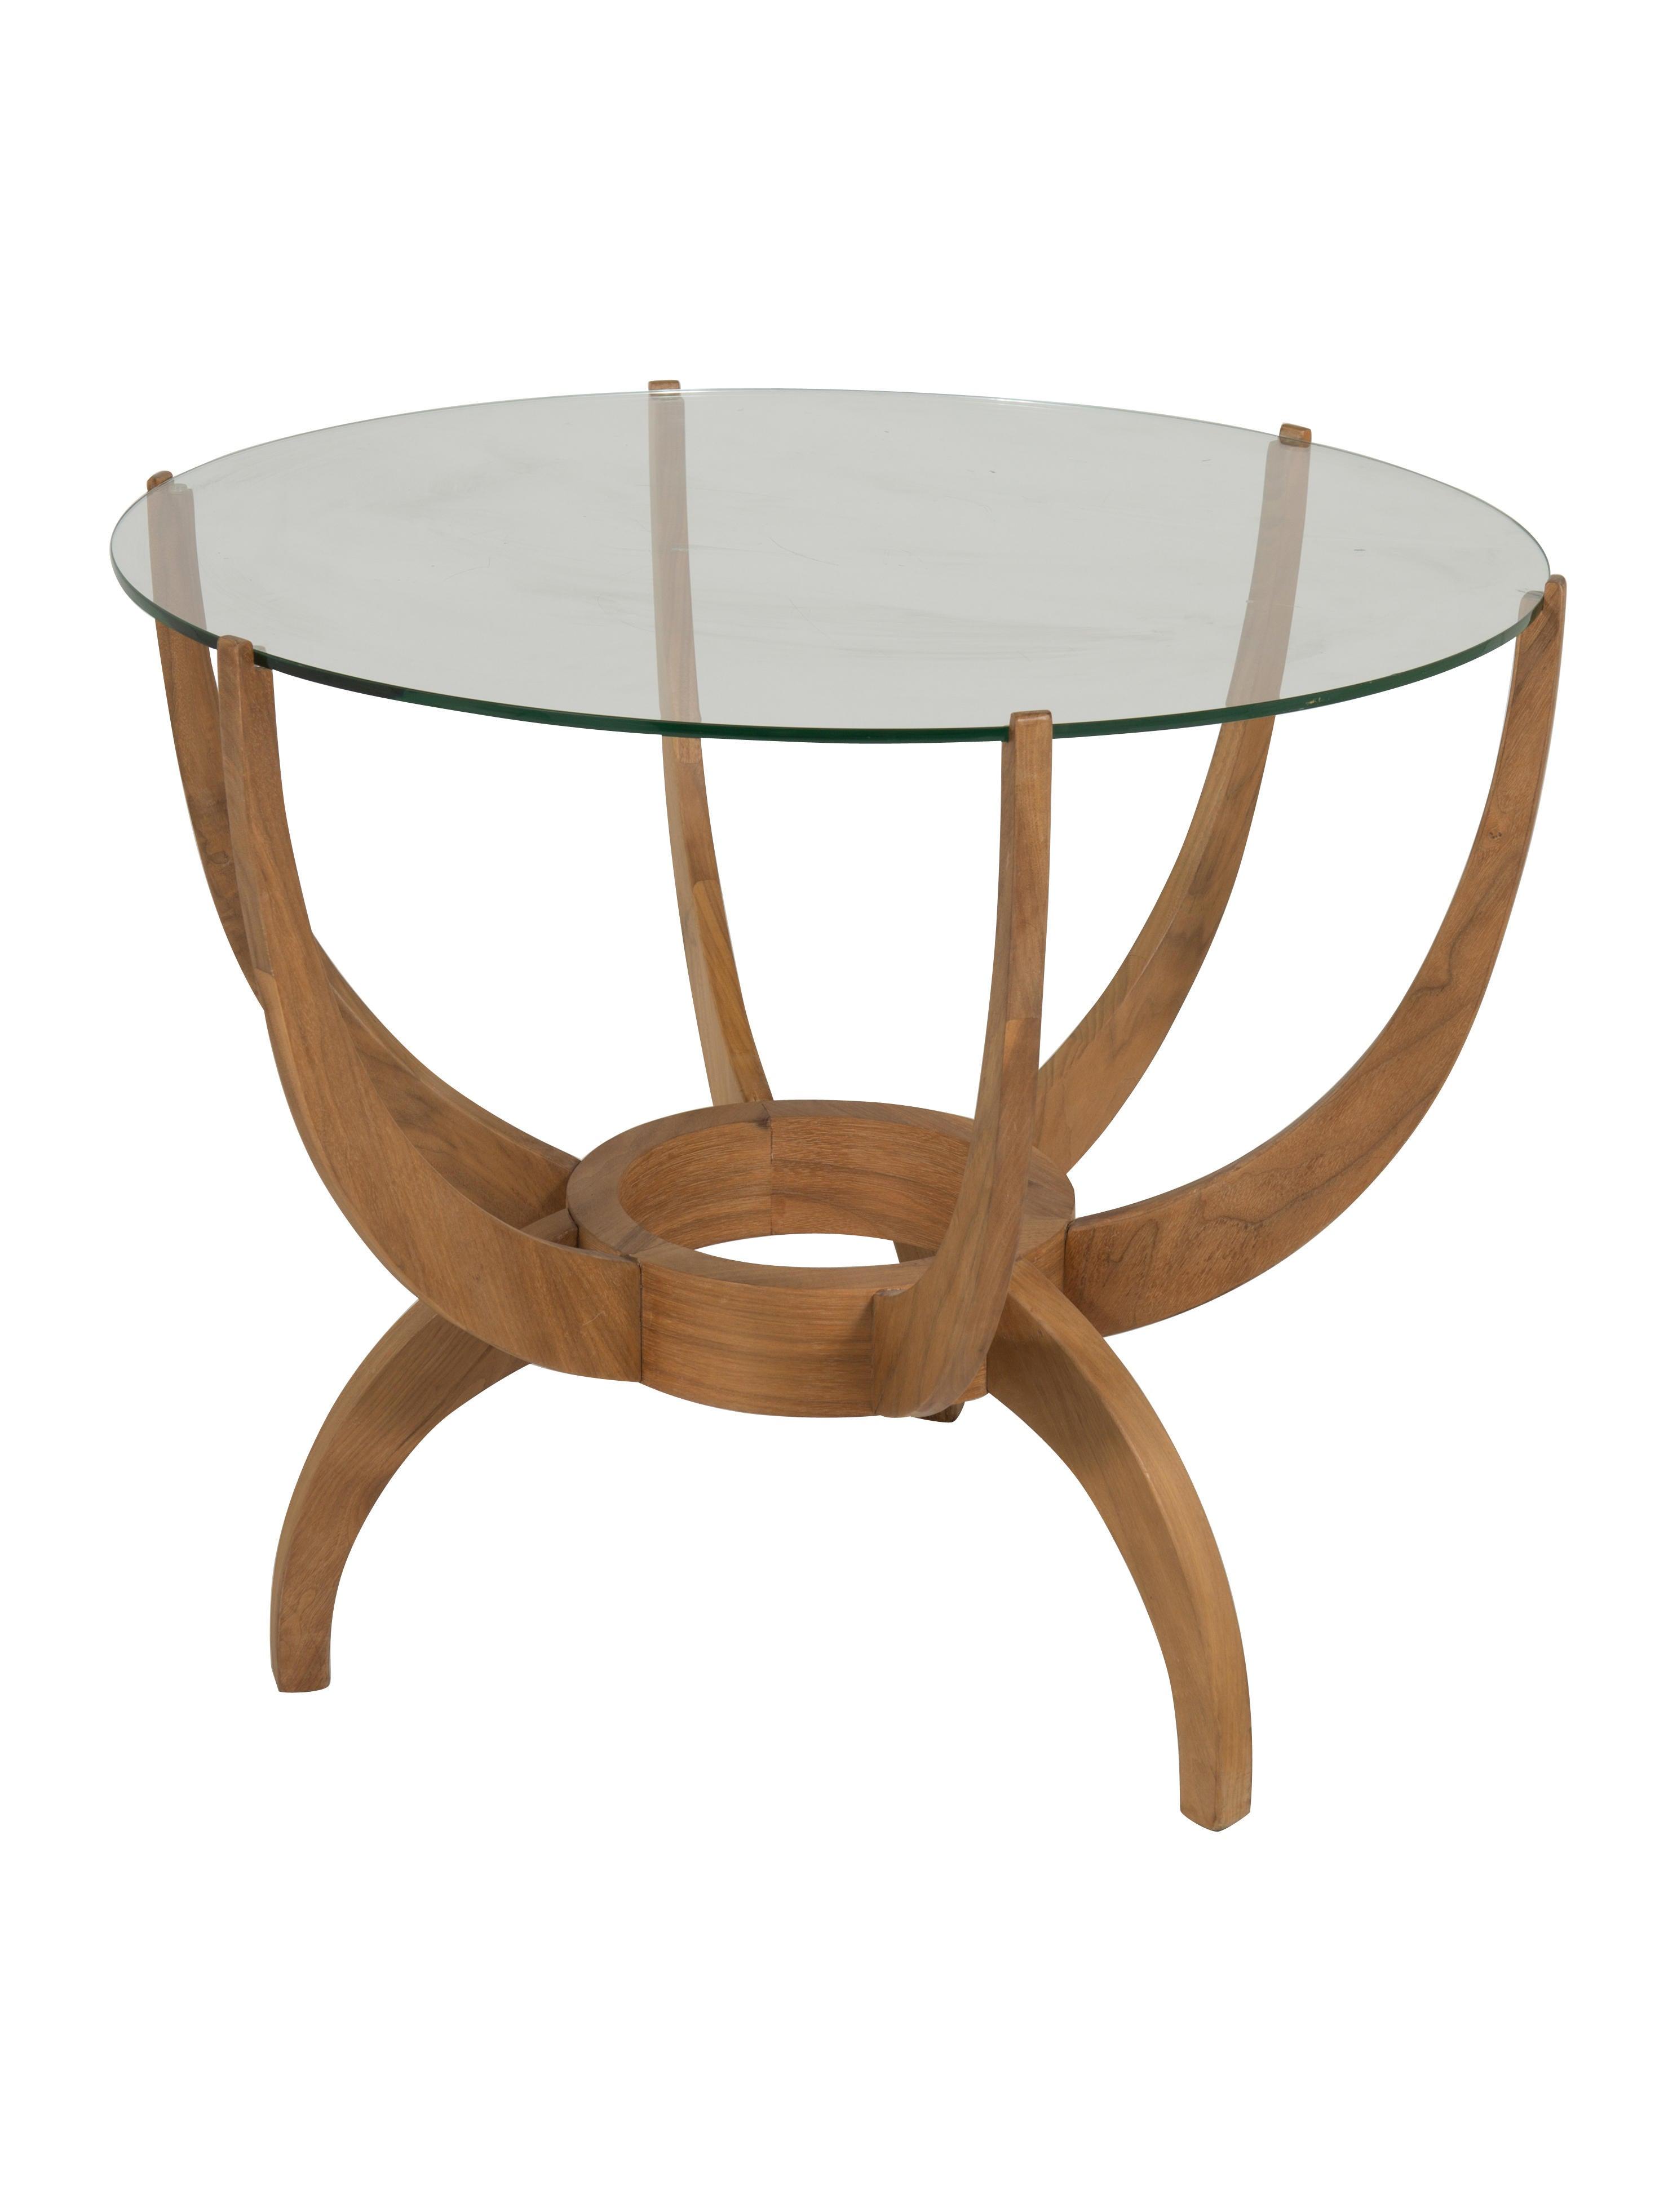 Oswald haerdtl walnut side table furniture oswld20001 for Walnut side table